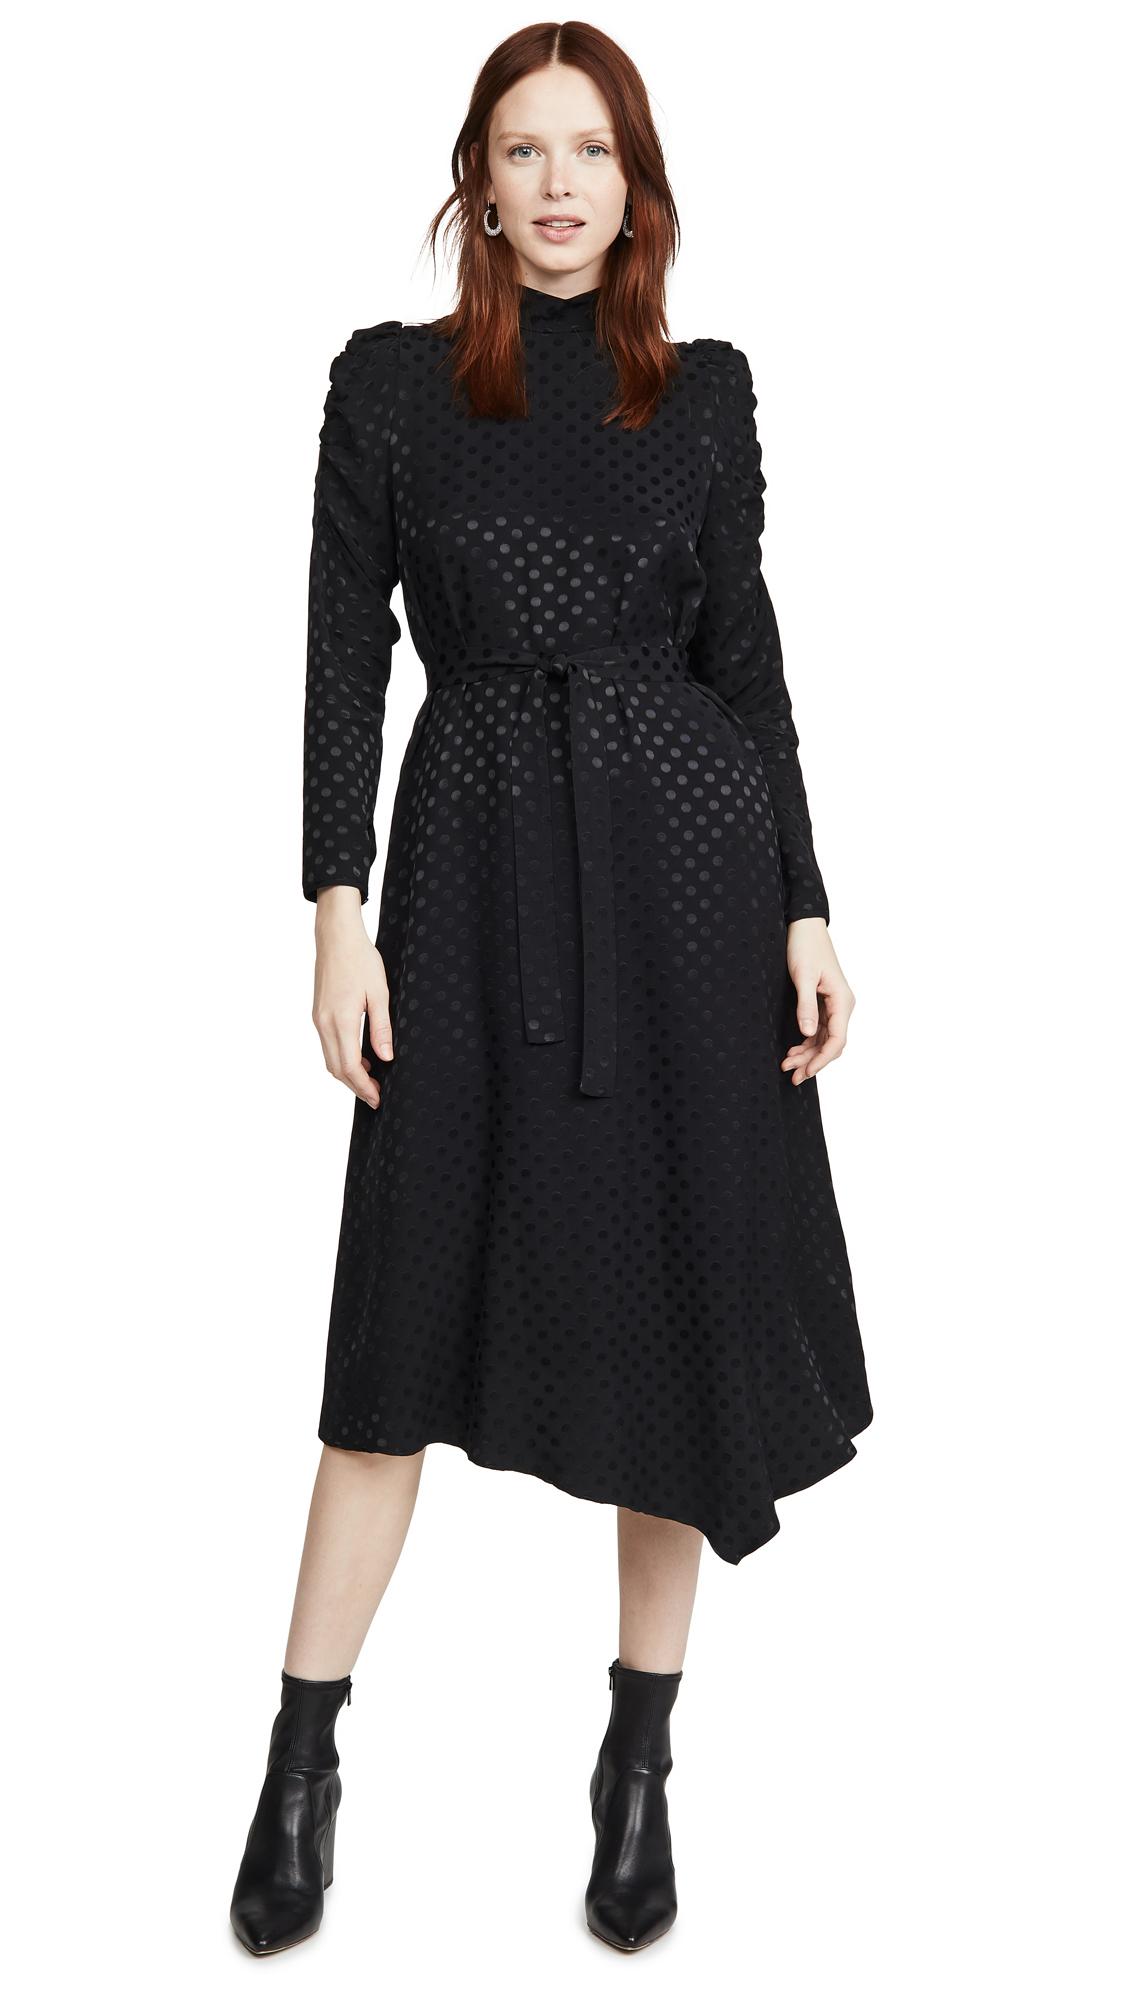 Paul Smith Black Long Sleeve Dot Dress - 40% Off Sale